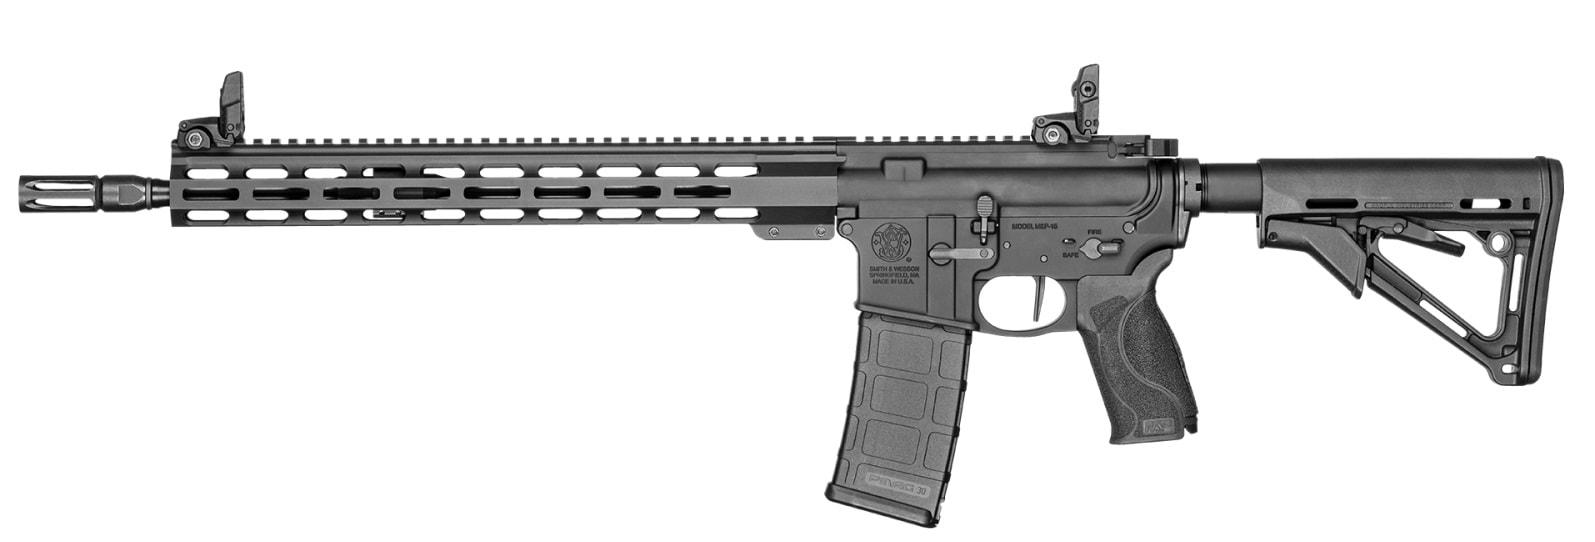 S&W M&P15 II rifle